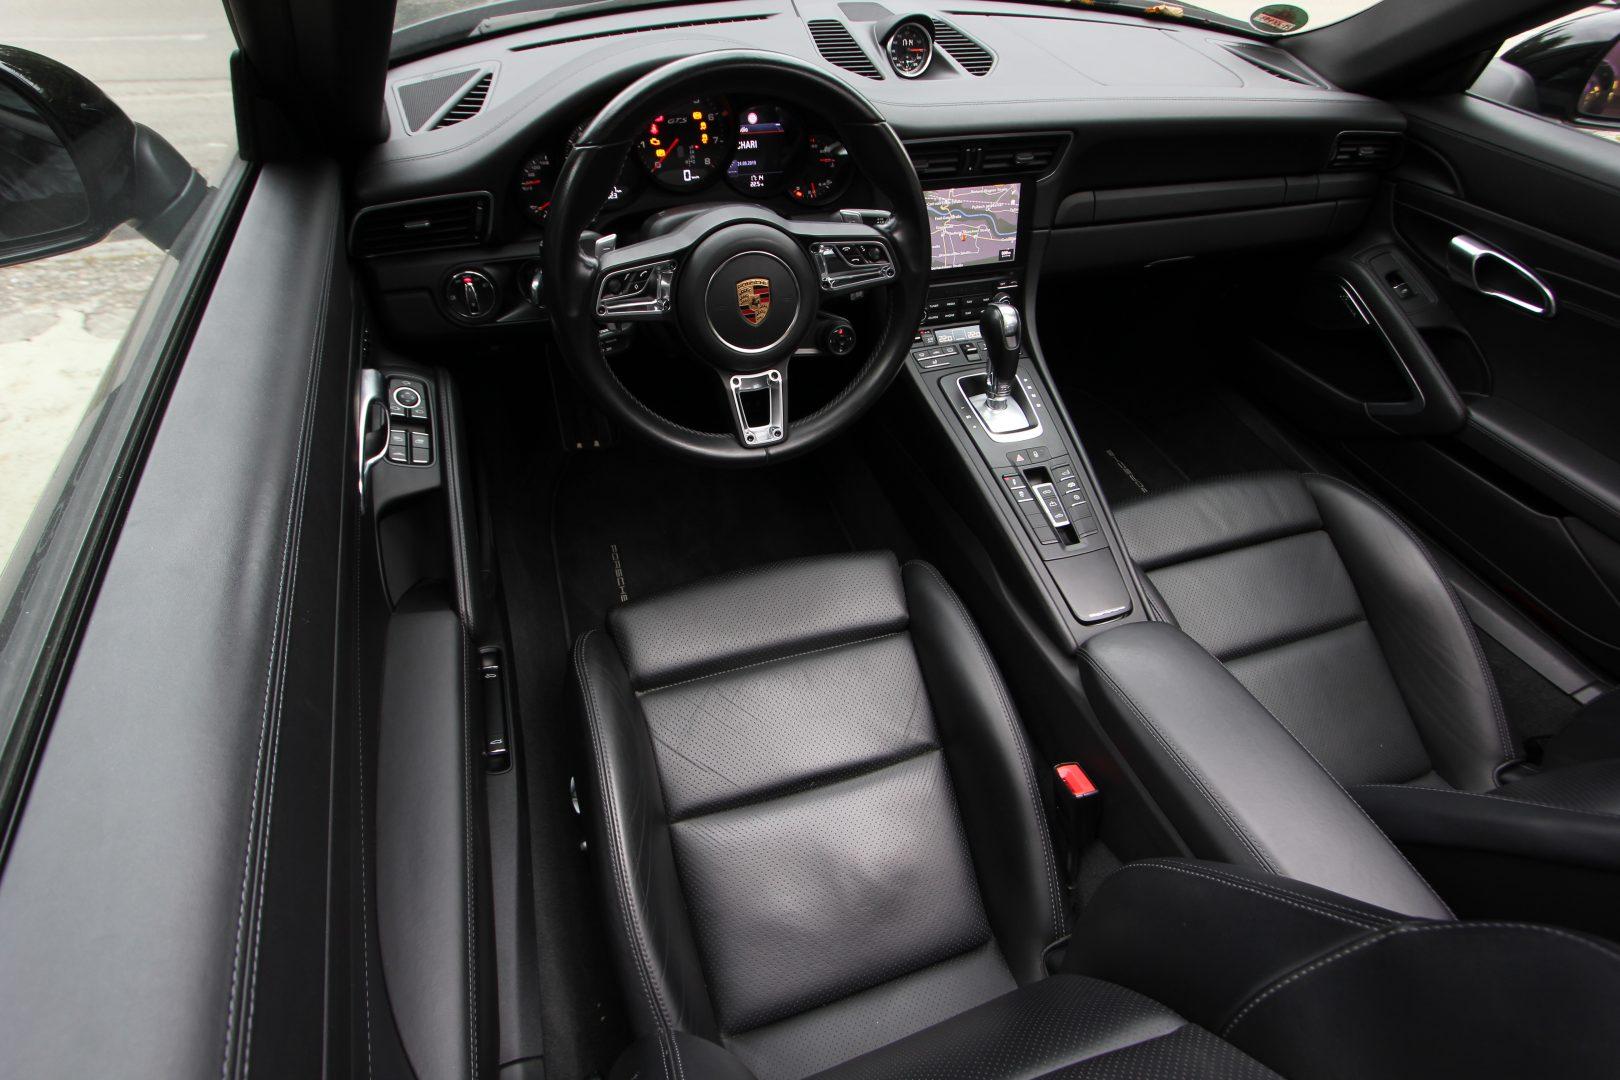 AIL Porsche 991 4 GTS Cabriolet LED Burmester High-End 3